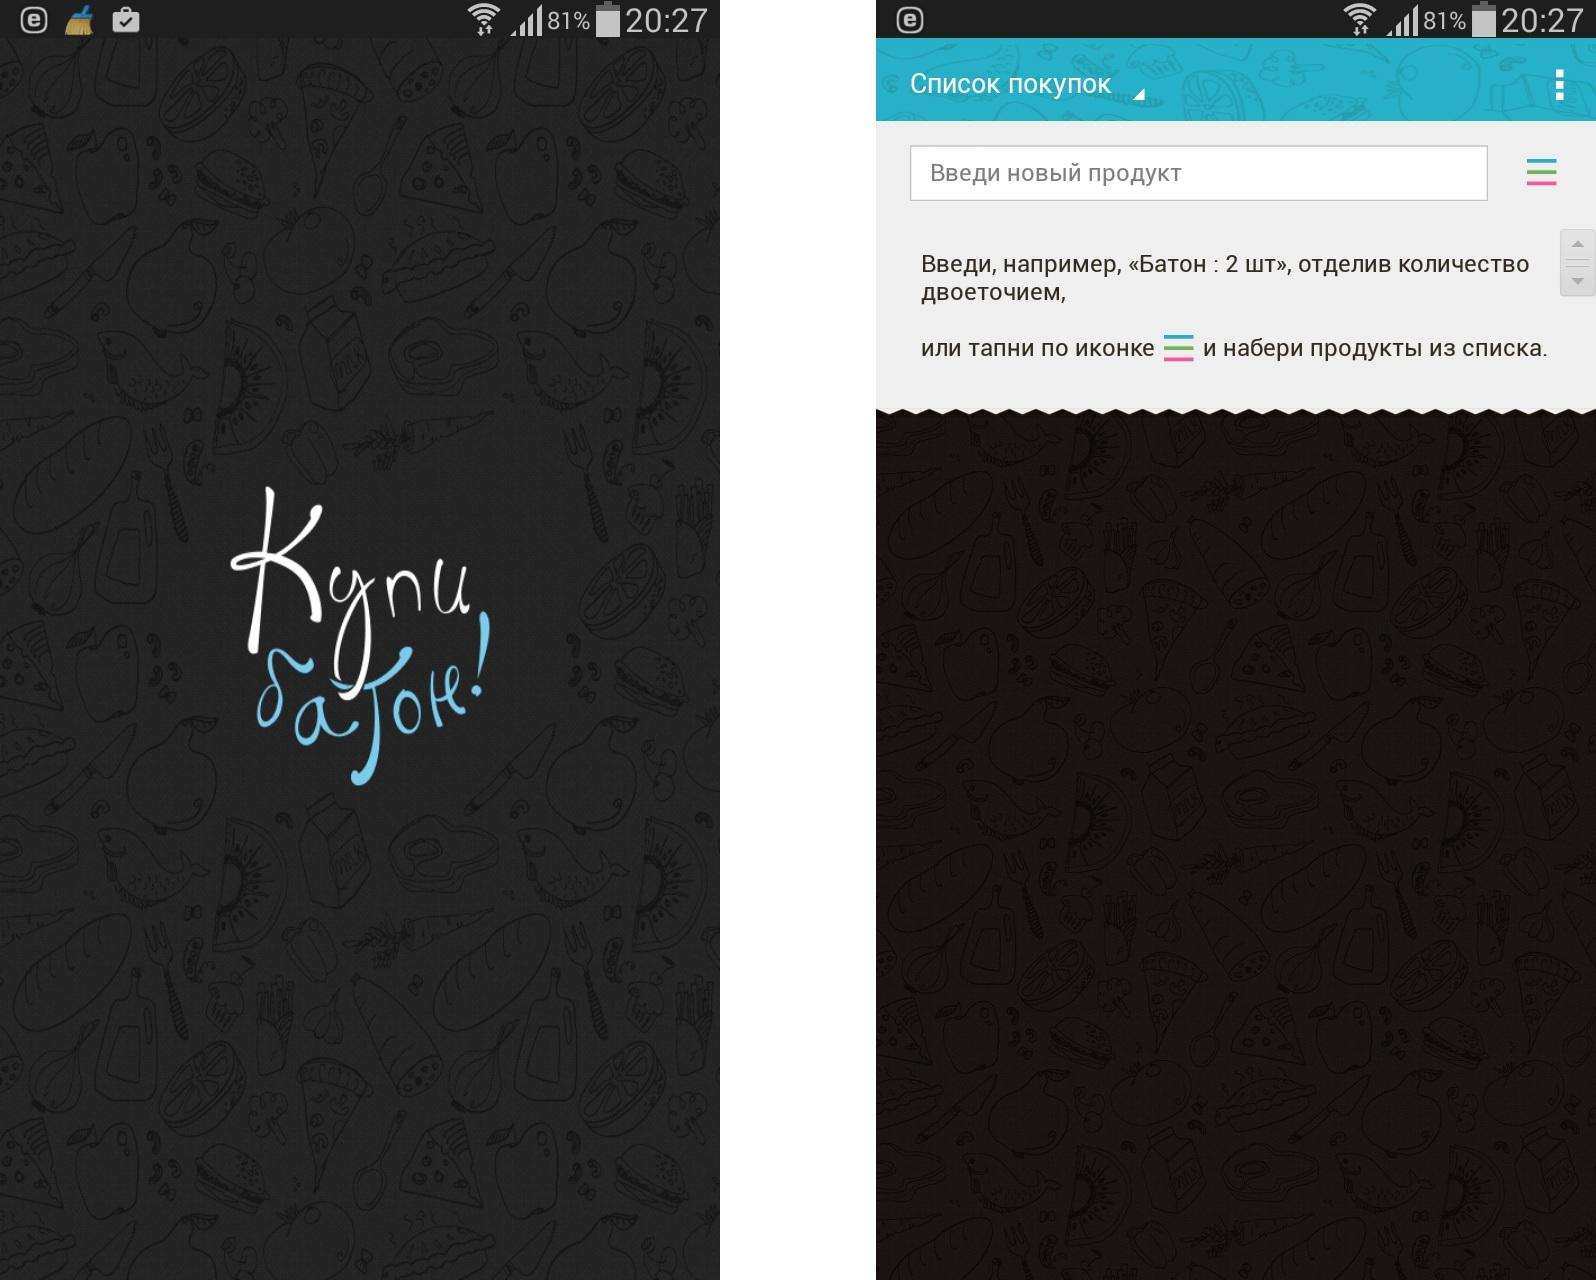 ТОП-20 приложений для Android - Купи Батон